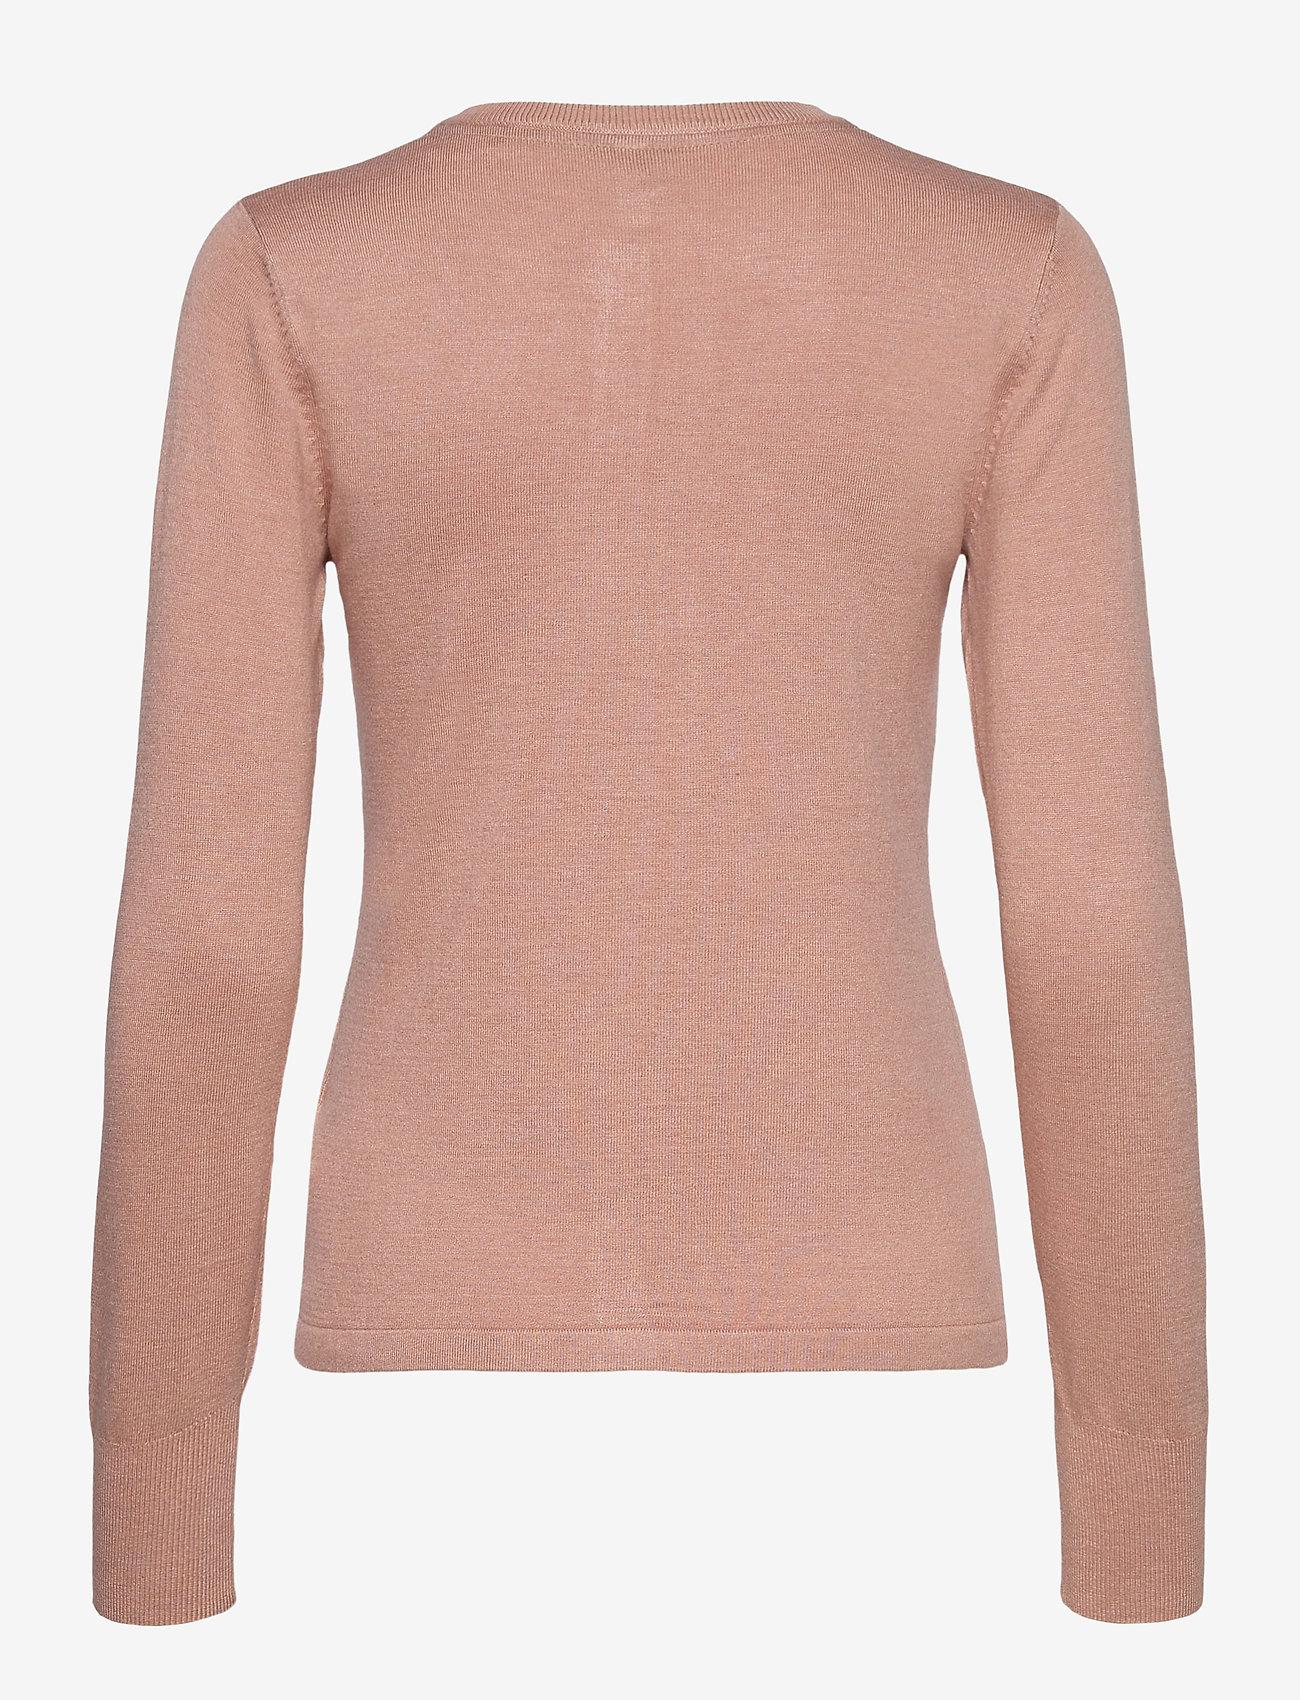 Pulz Jeans - PZSARA Cardigan - cardigans - mahogany rose melange - 1